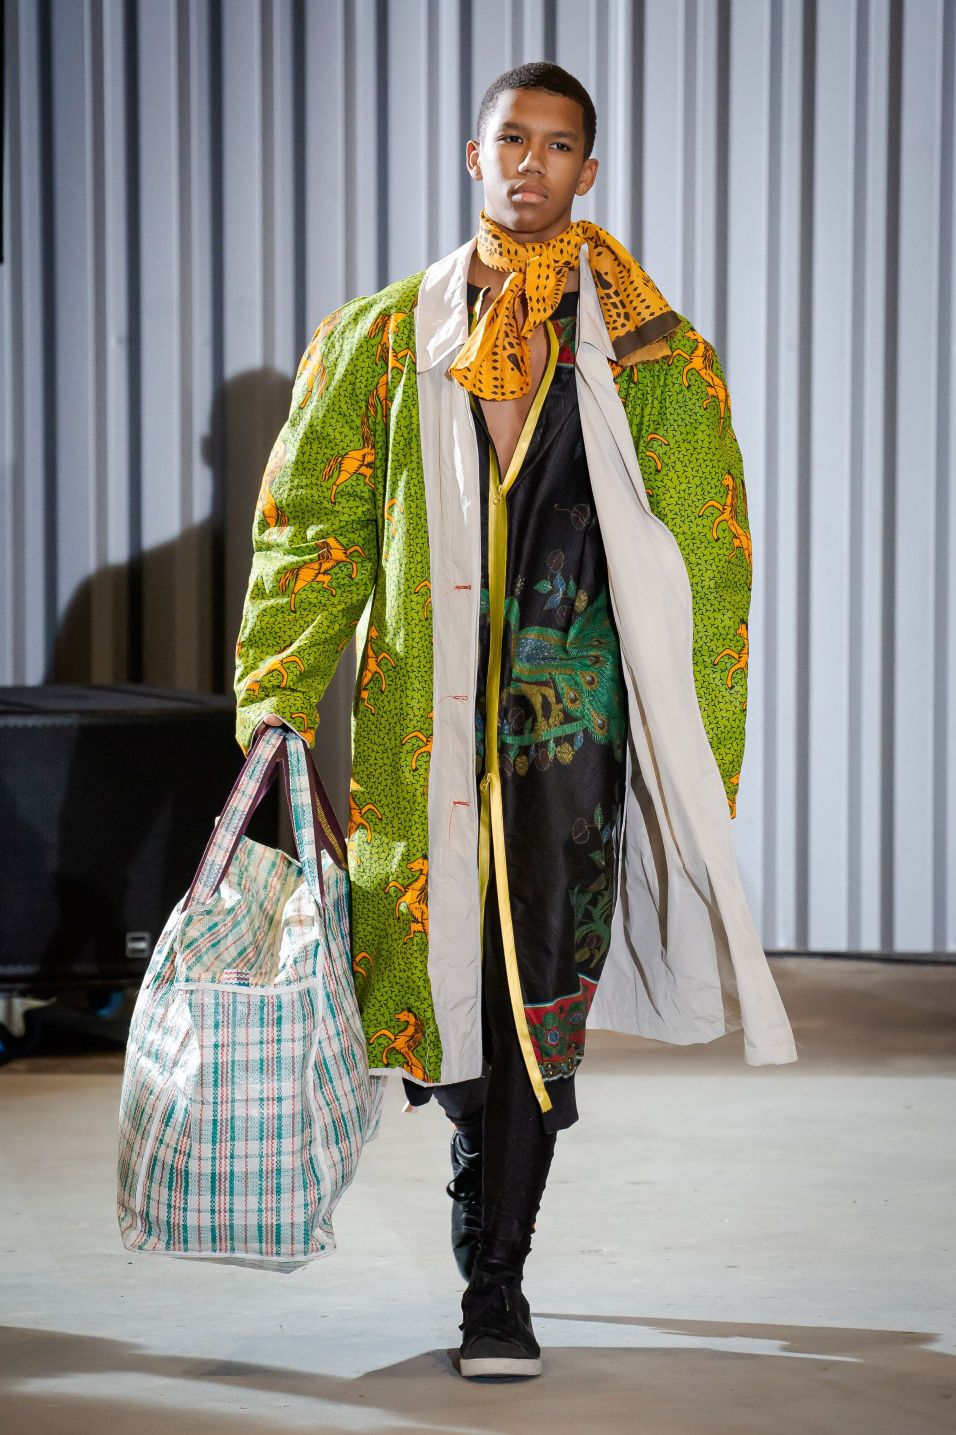 paris-fashion-week-2020-ss-2021